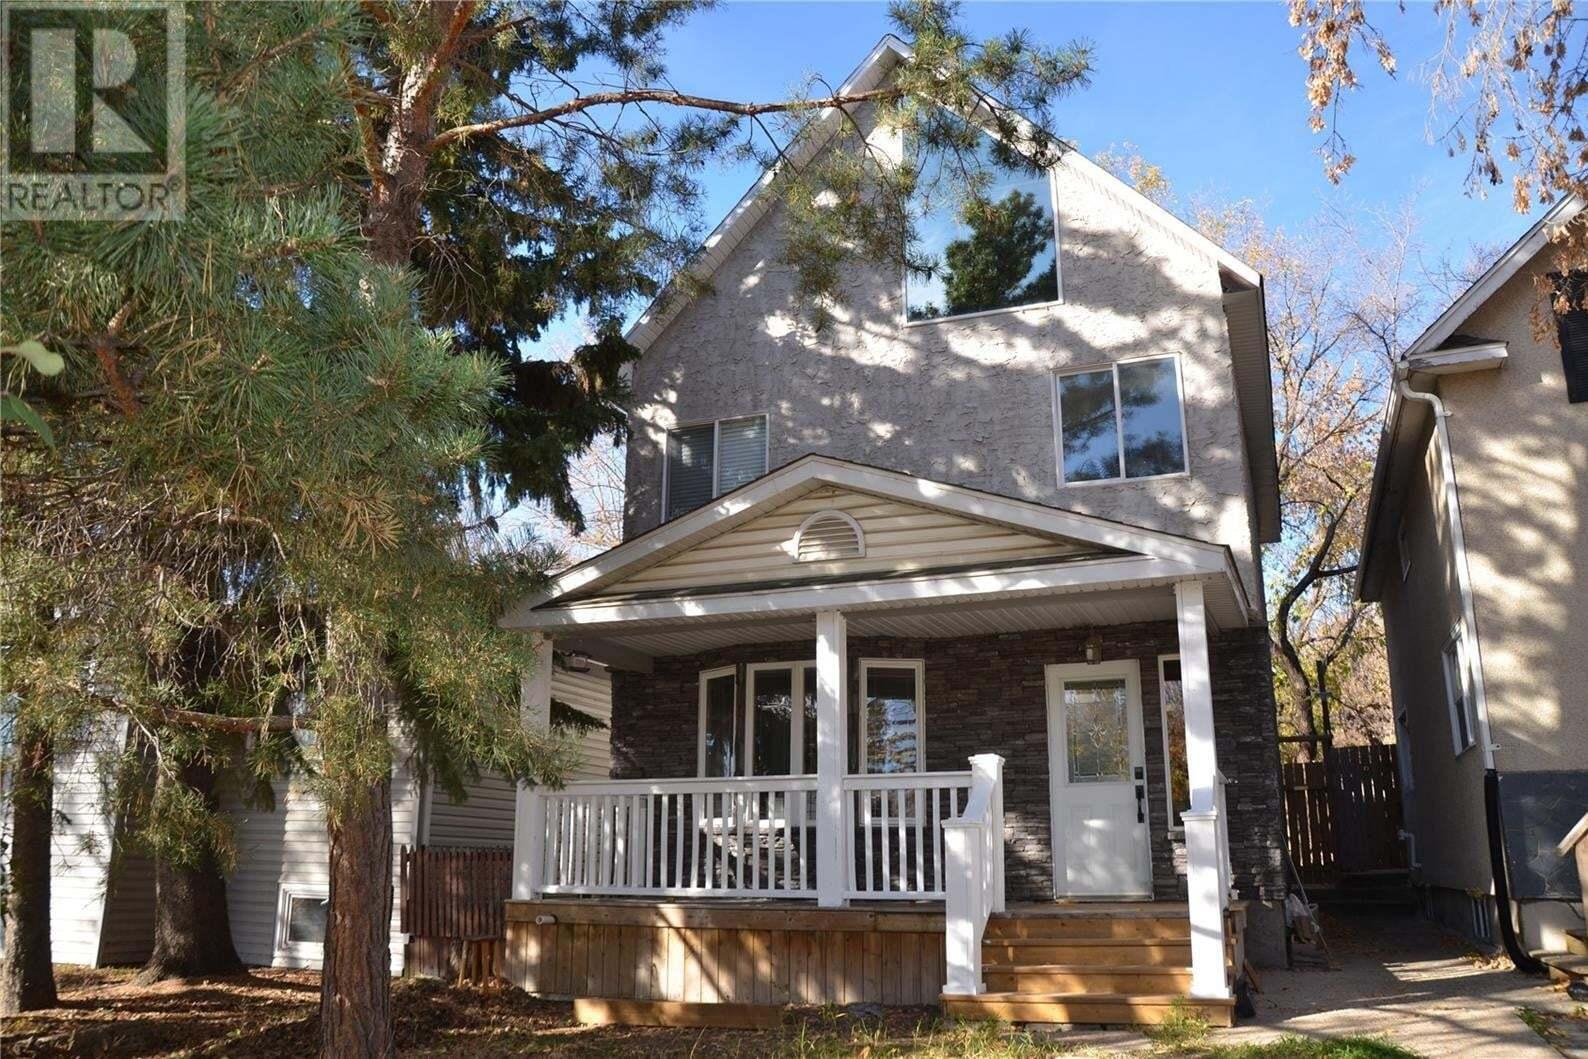 House for sale at 213 H Ave N Saskatoon Saskatchewan - MLS: SK830122